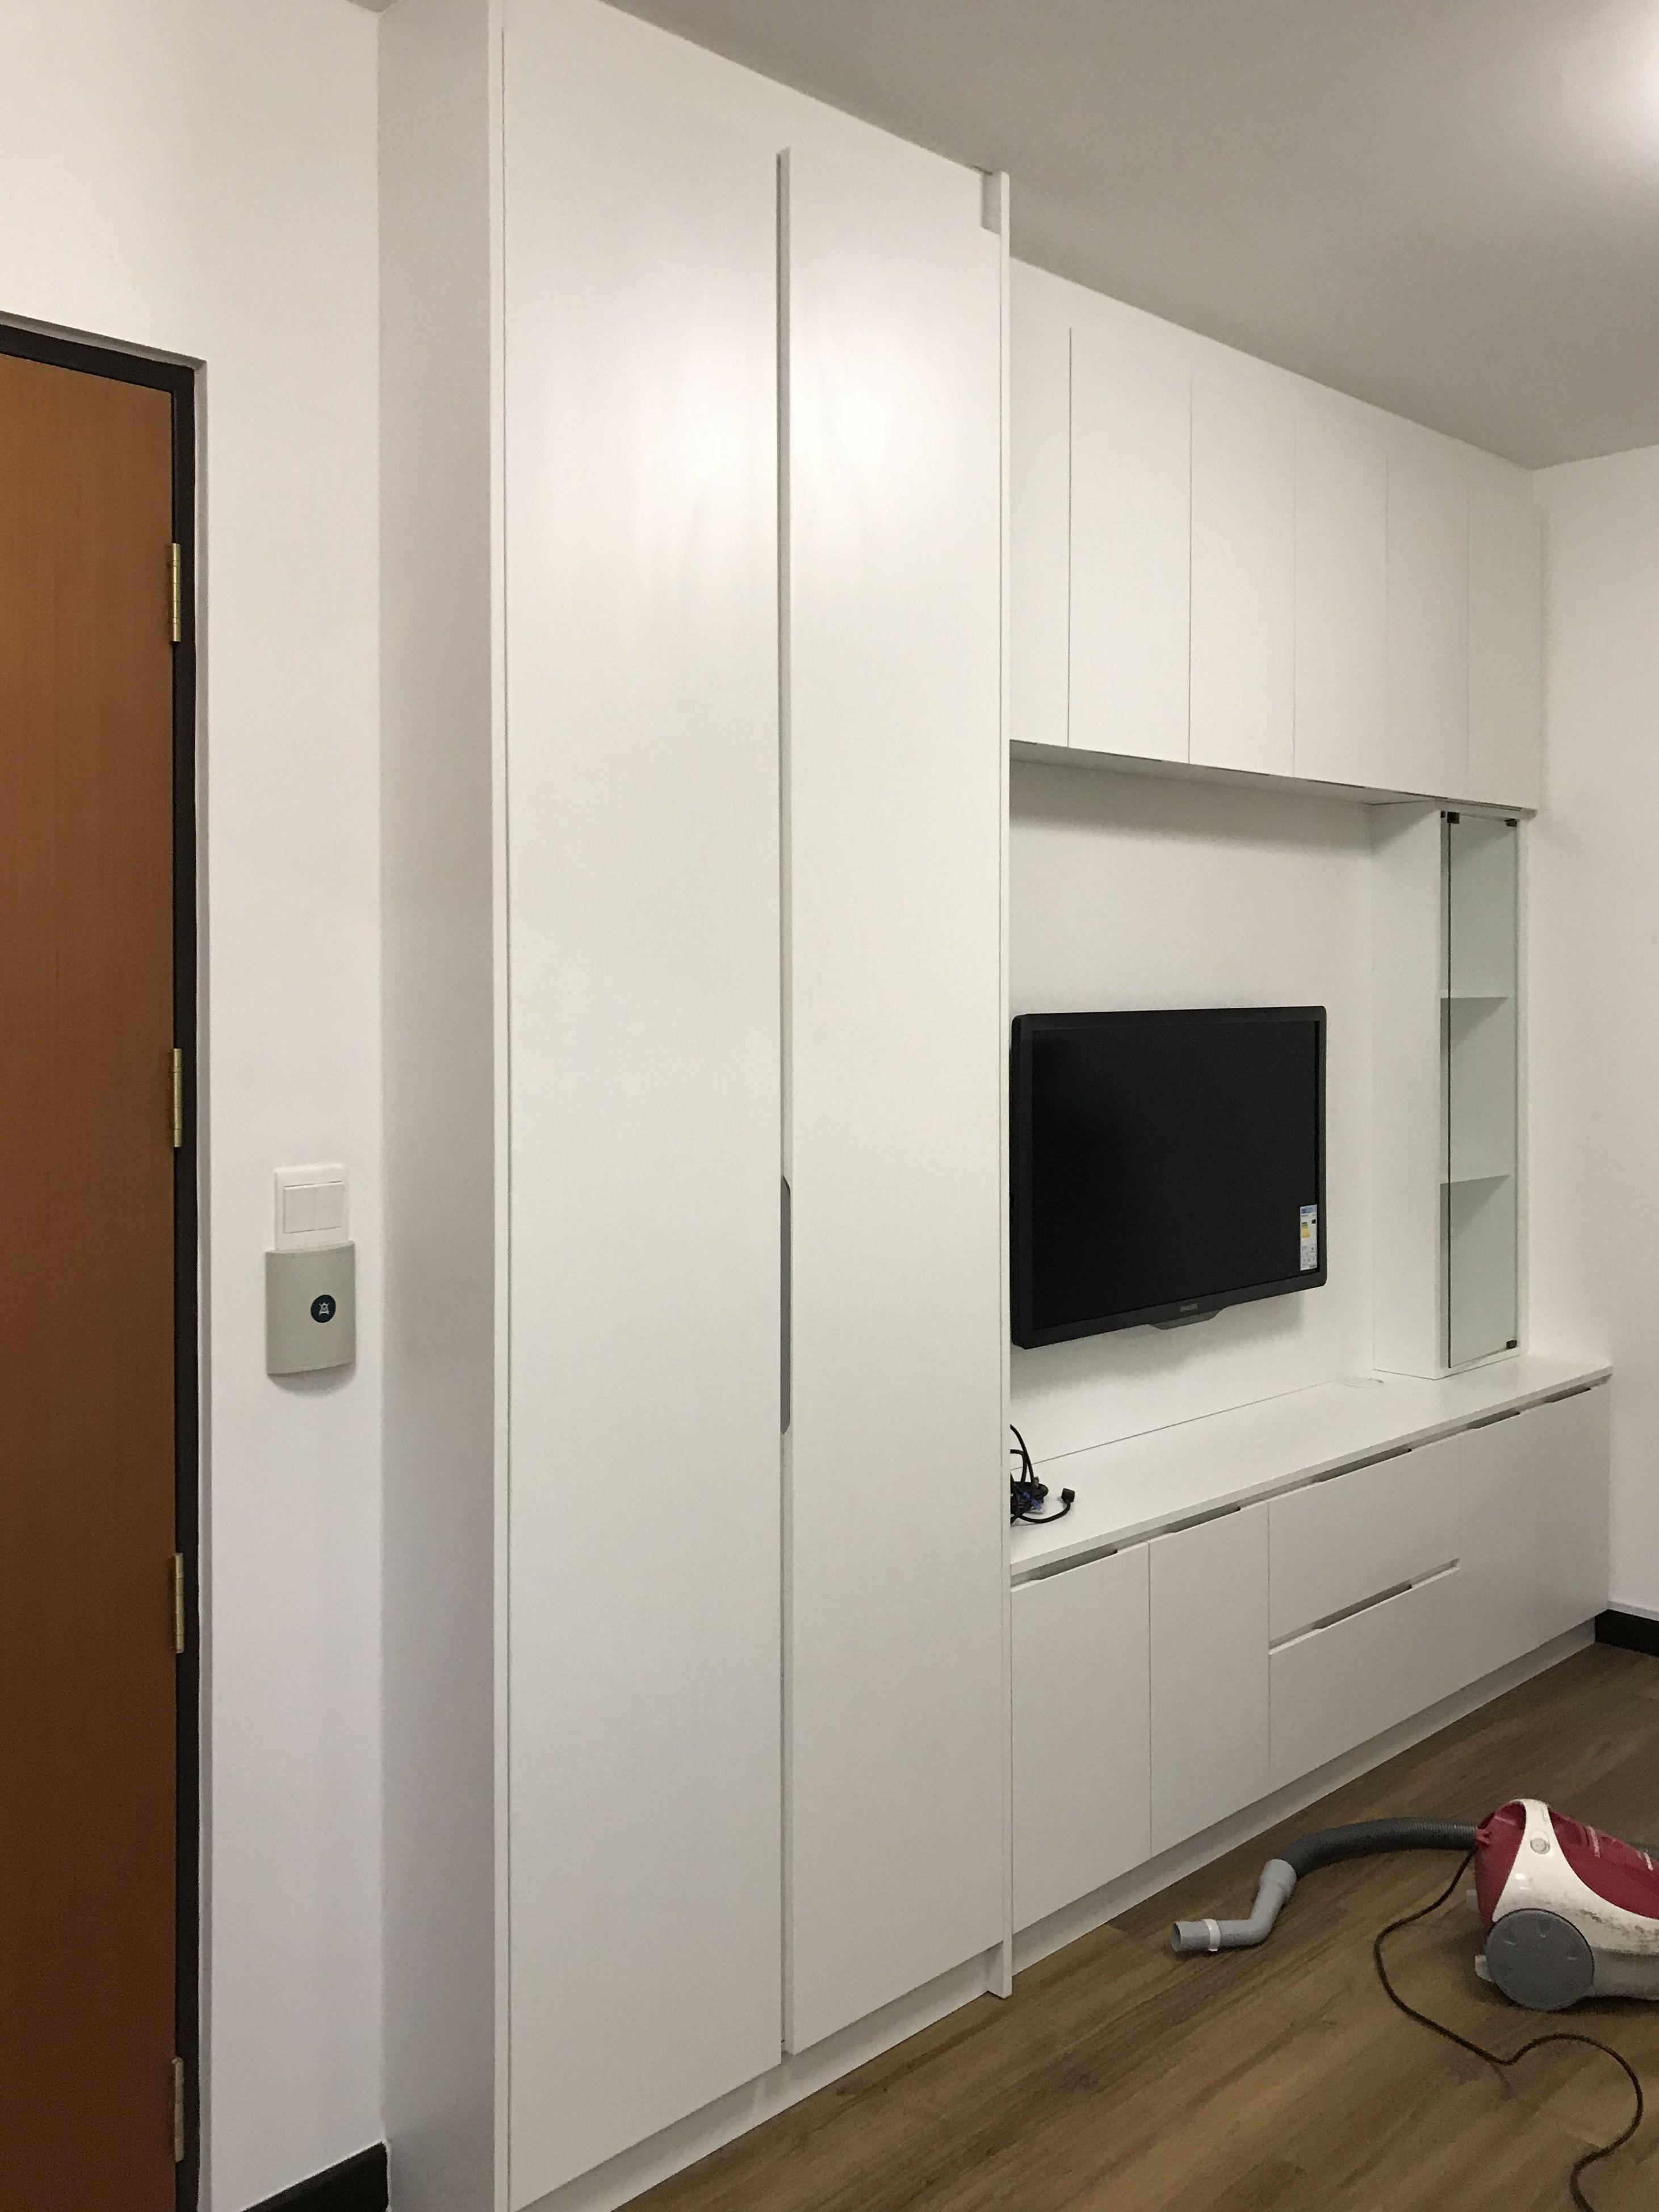 Full Height Storage Material Melamine Board Tall Cabinet Storage Furniture Design Storage